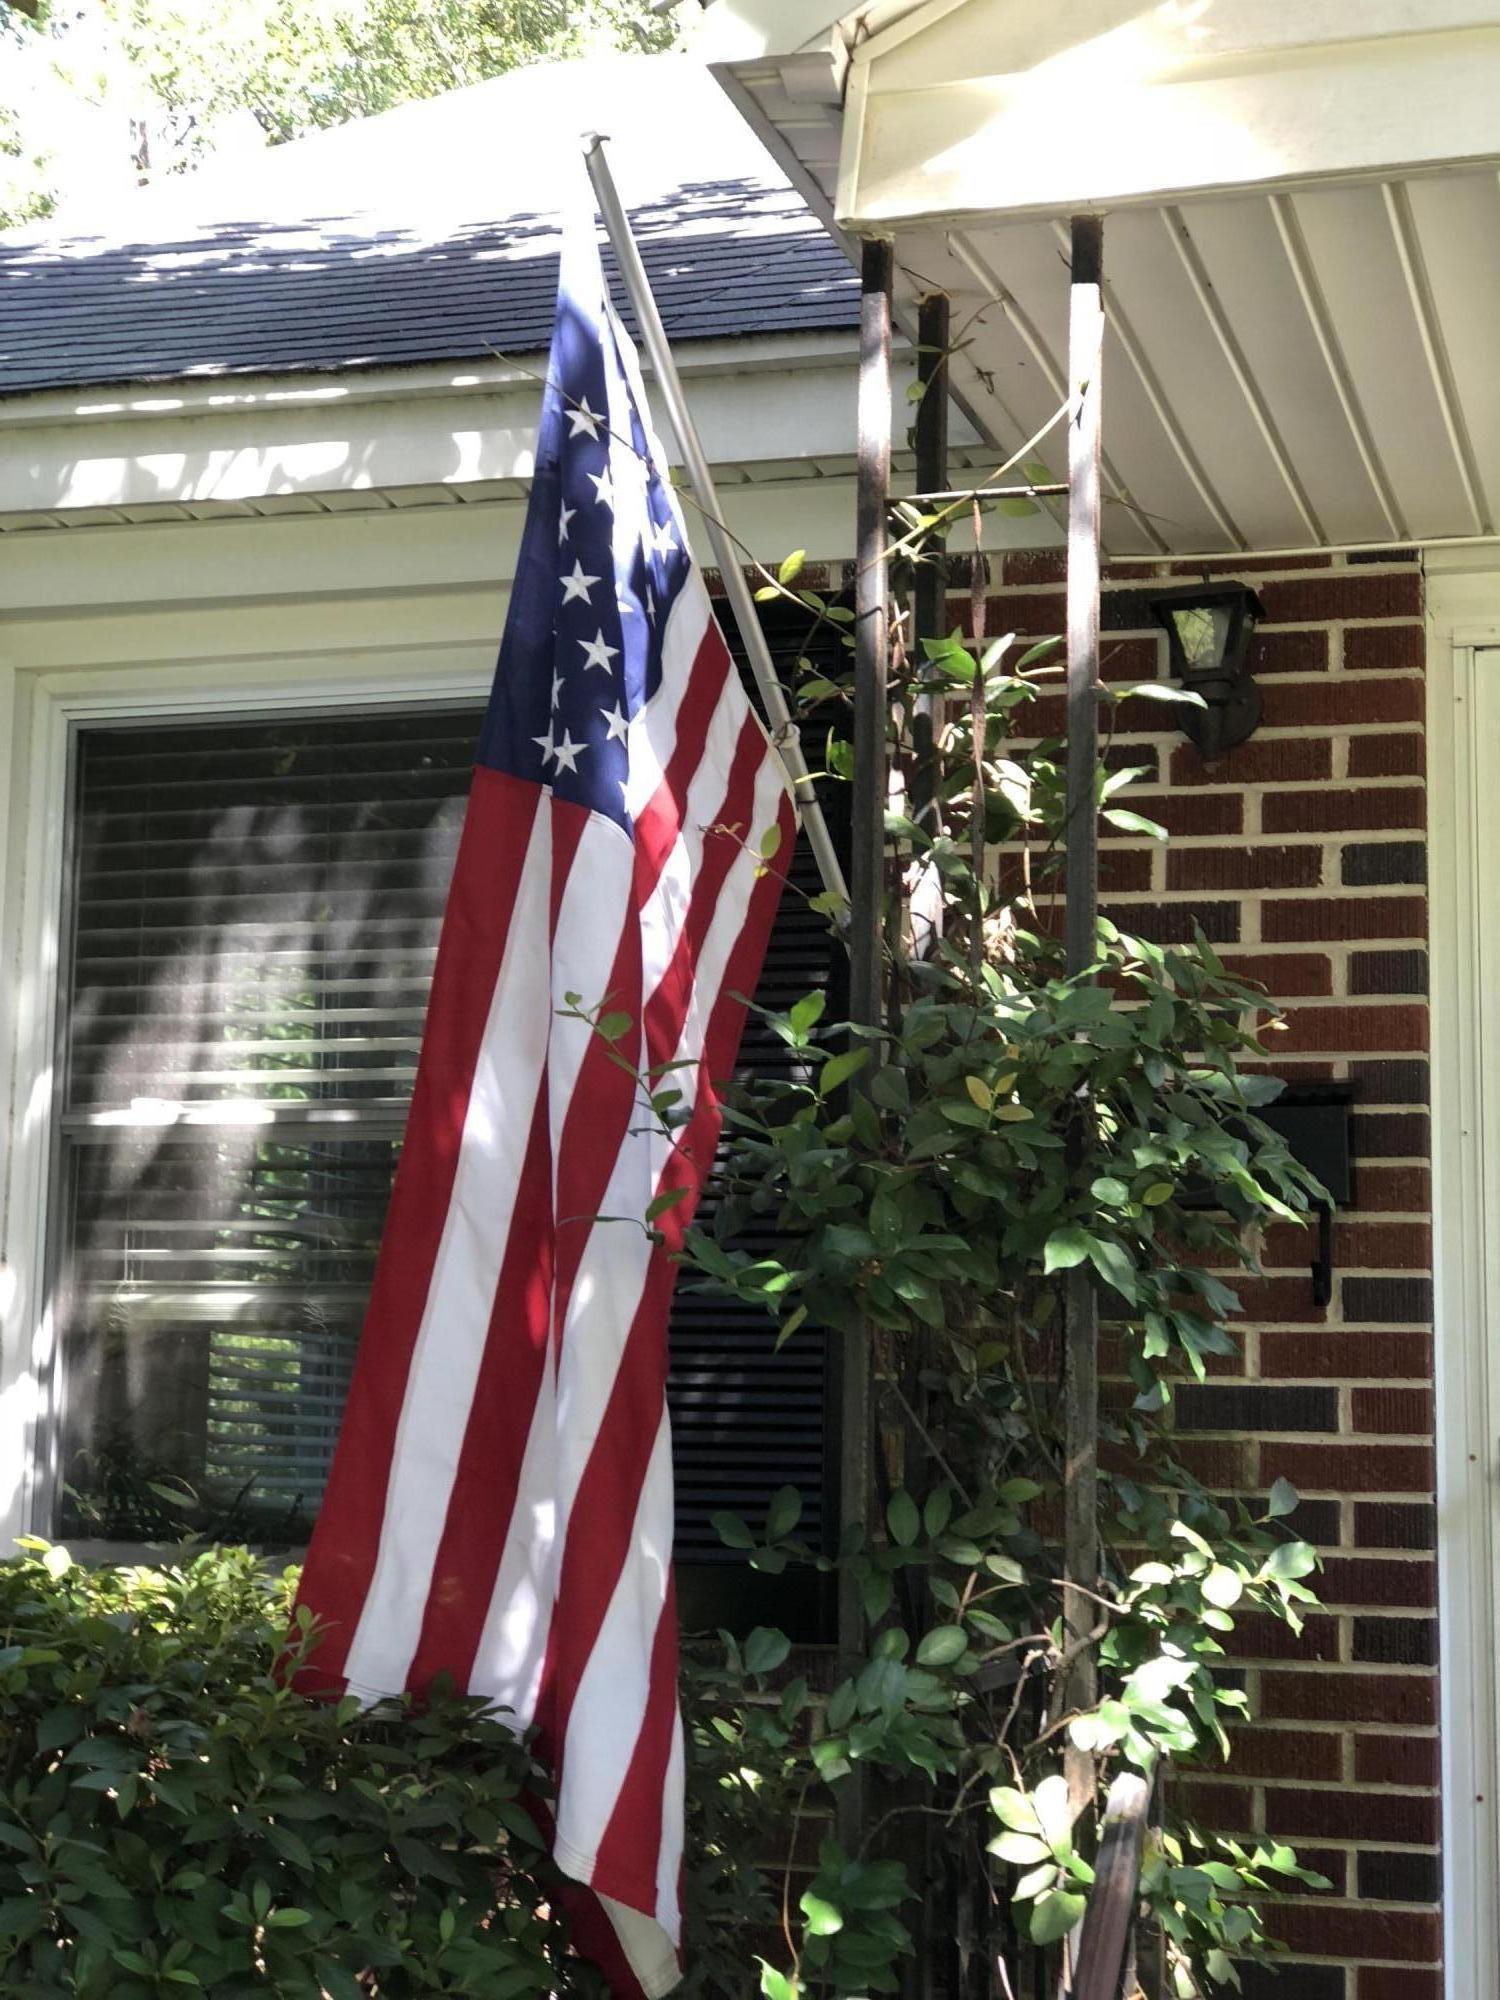 Edgewood Gardens Homes For Sale - 516 Risher, Charleston, SC - 1